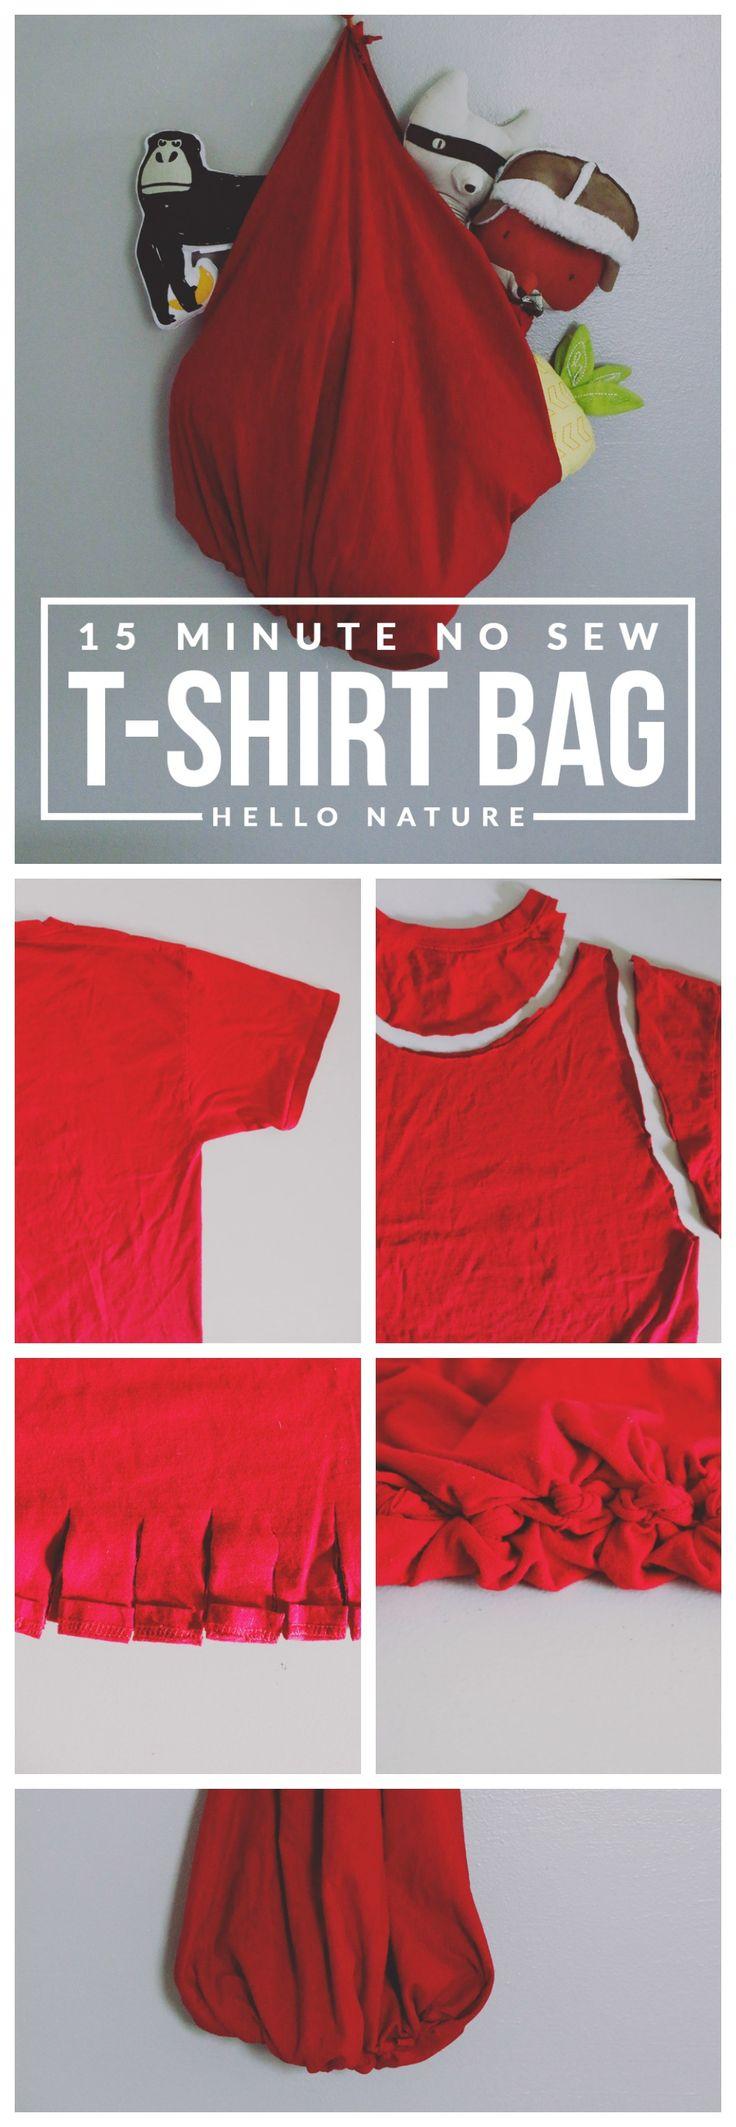 Design your own eco-friendly t-shirt - 15 Minute No Sew T Shirt Bag Diy